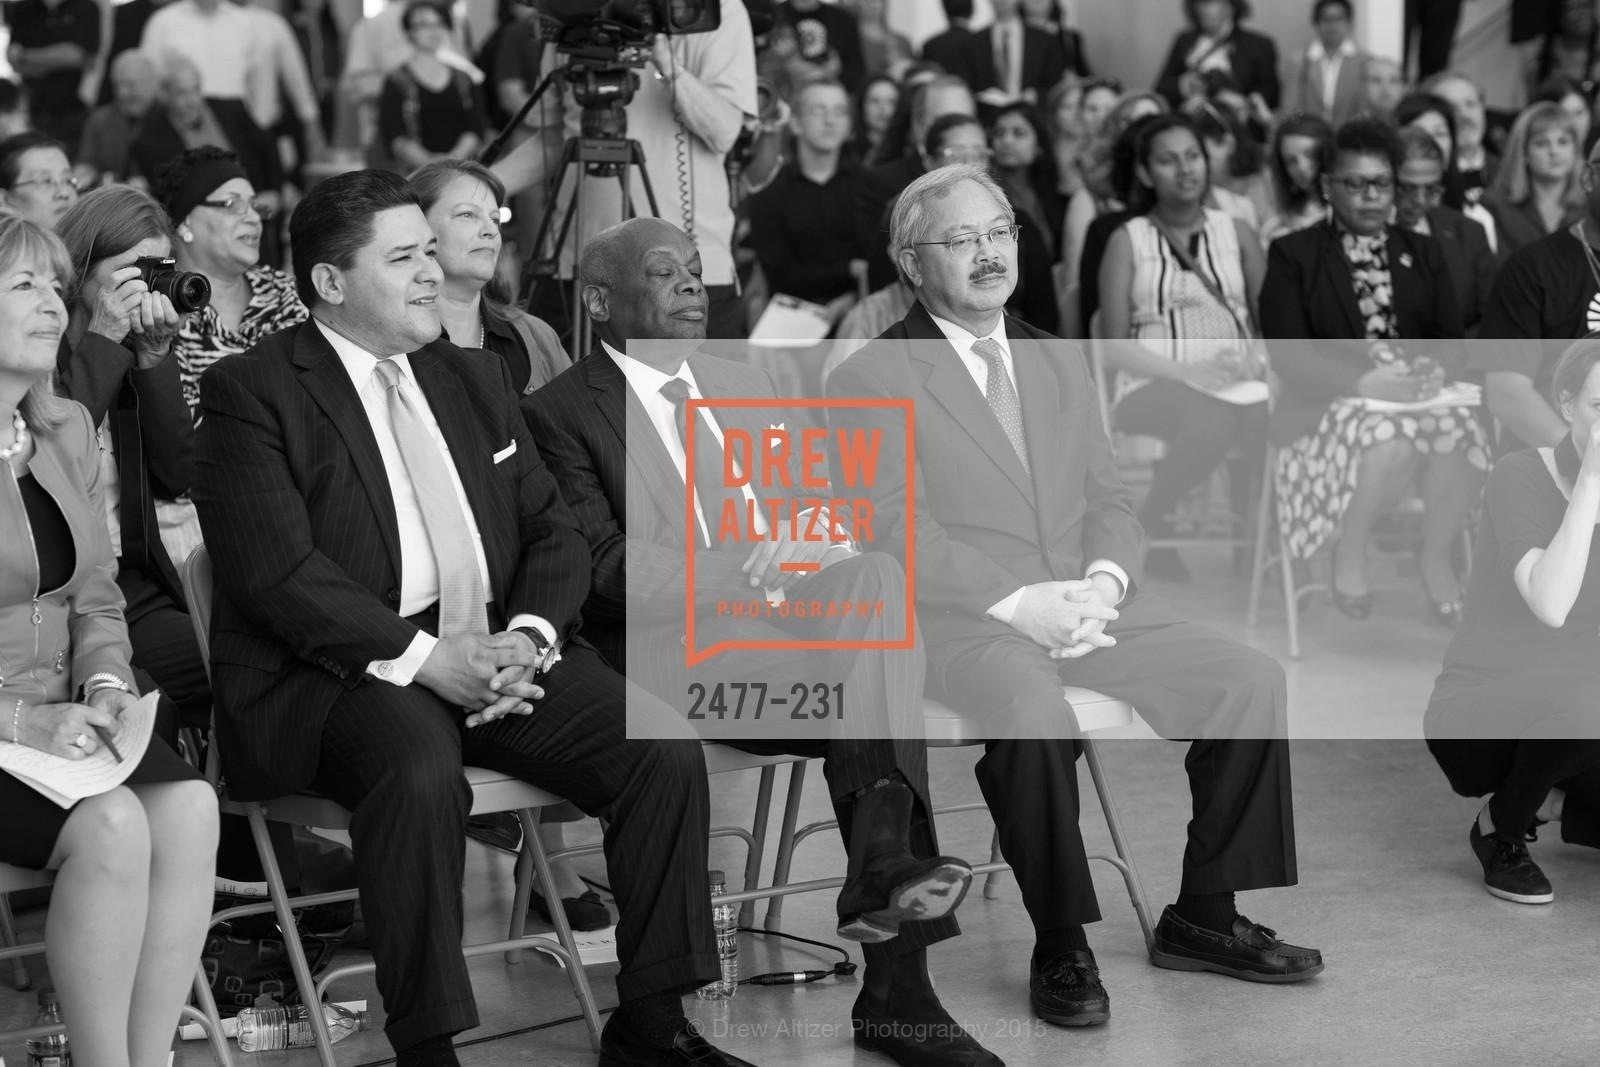 Richard Carranza, Willie Brown, Ed Lee, Photo #2477-231